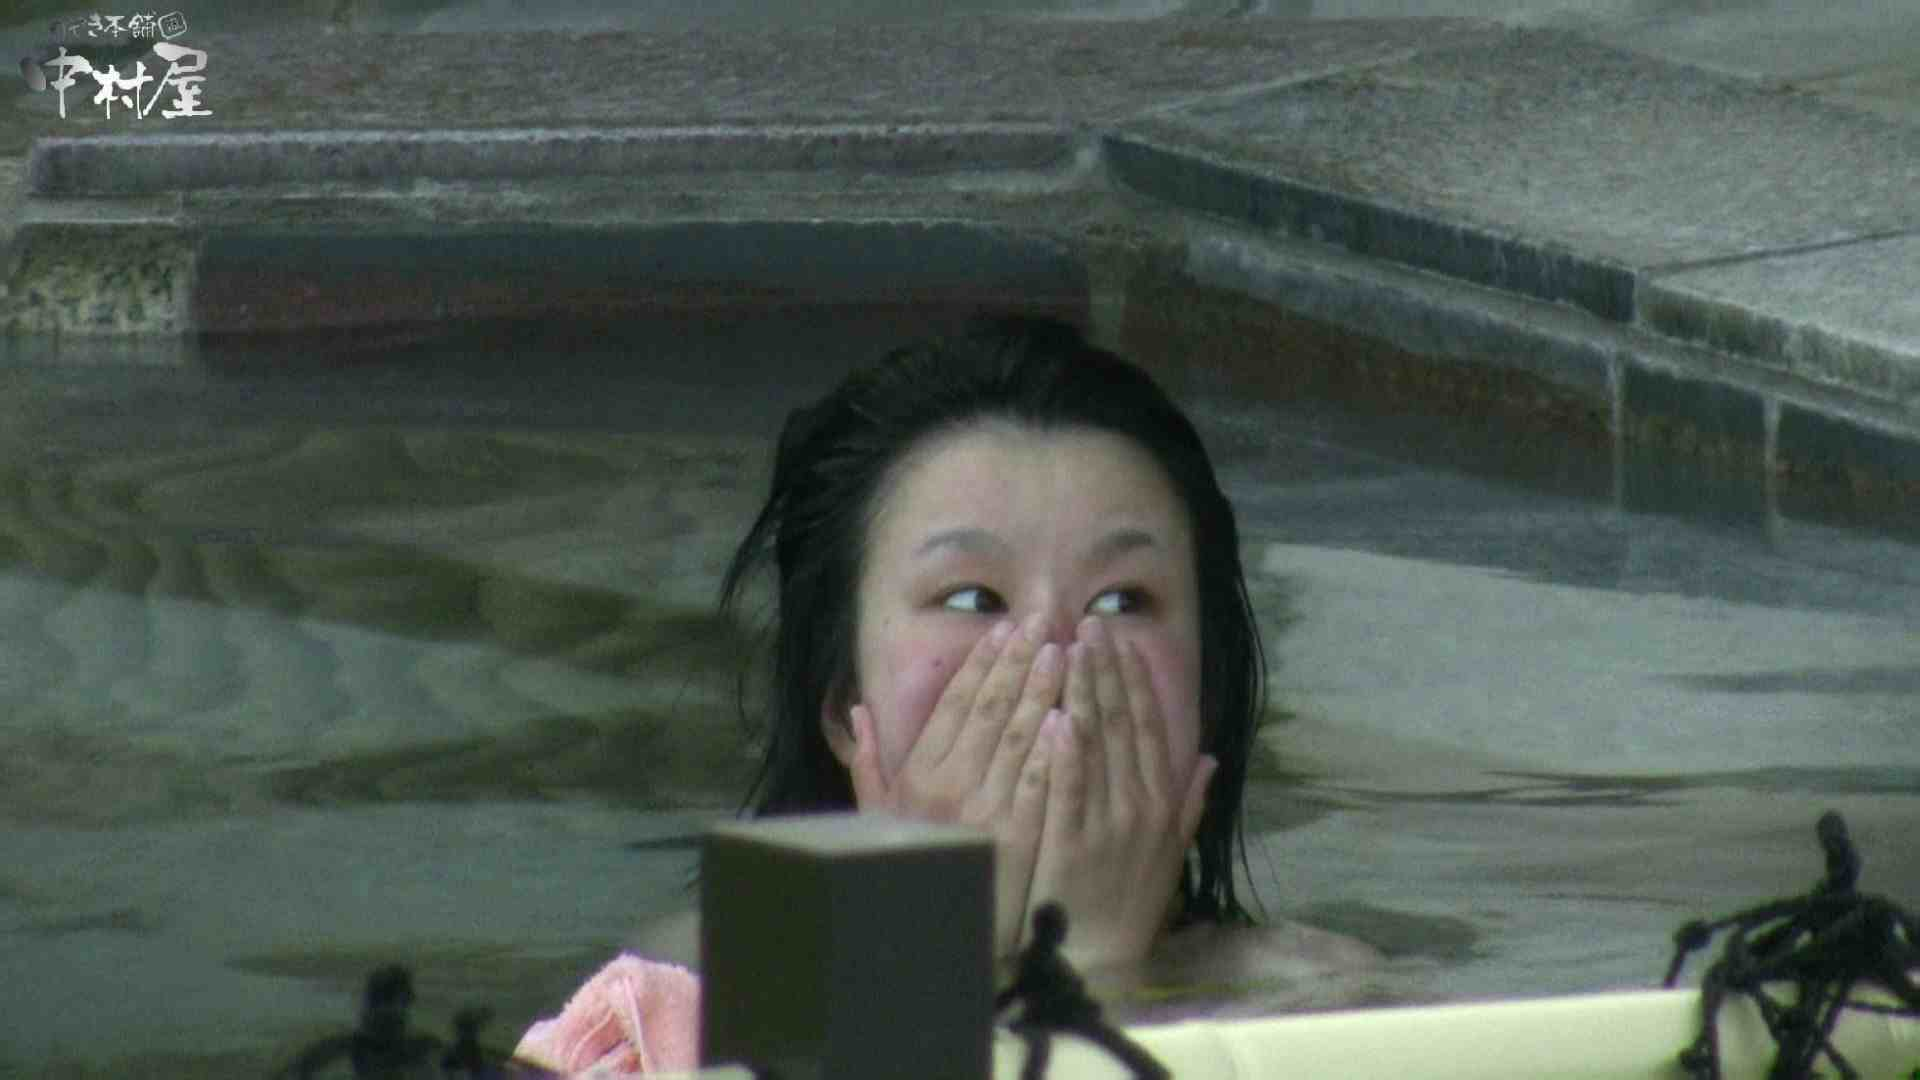 Aquaな露天風呂Vol.982 露天風呂突入 SEX無修正画像 78pic 41